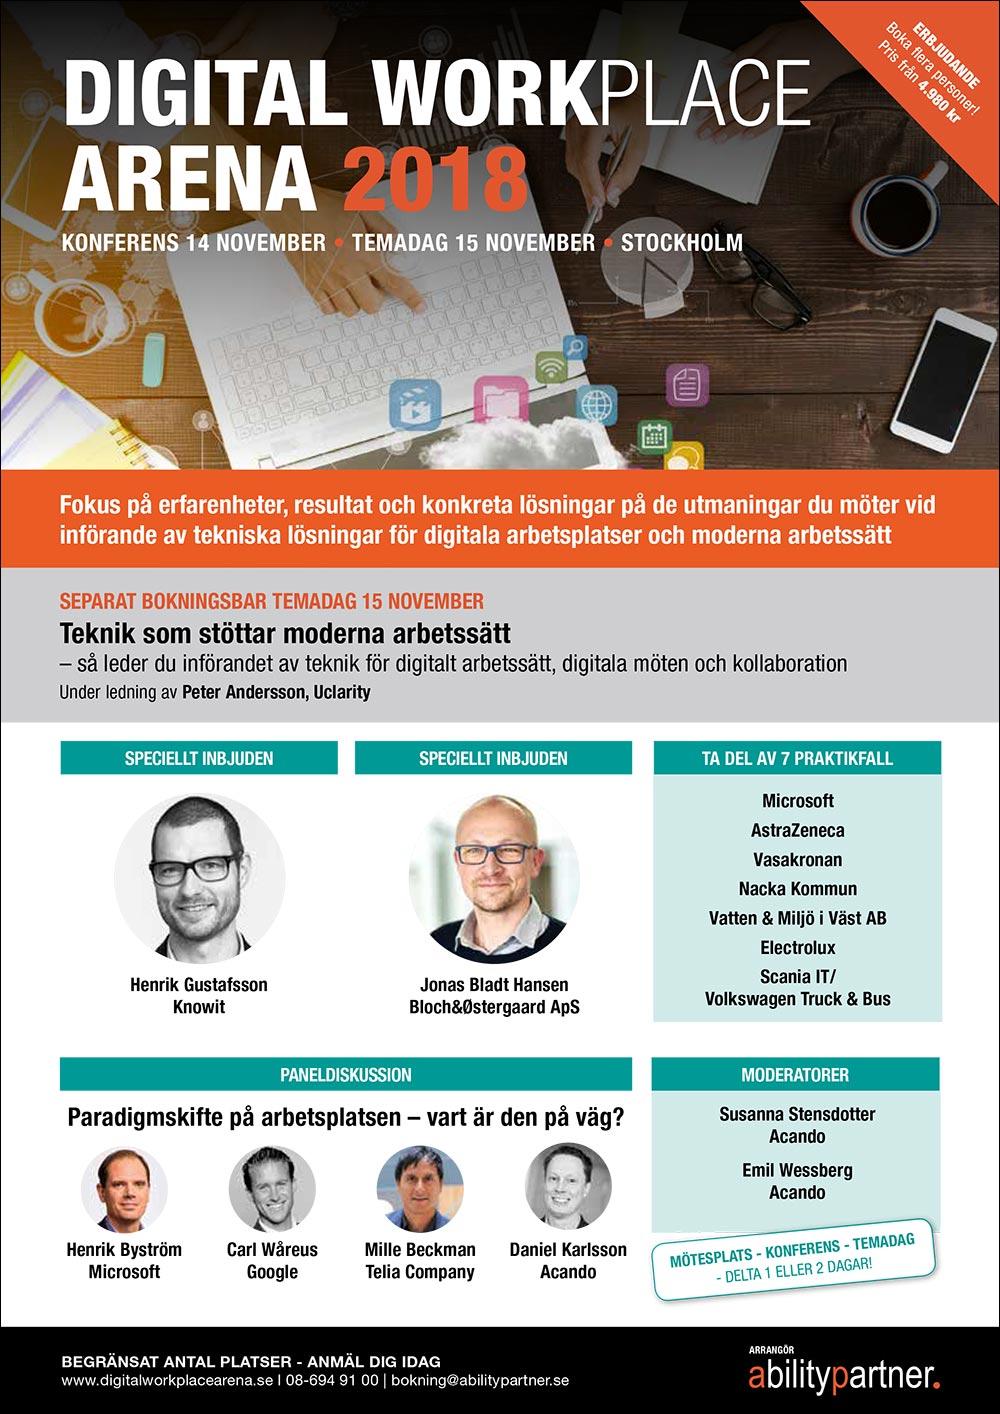 Digital-Workplace-Arena-2018